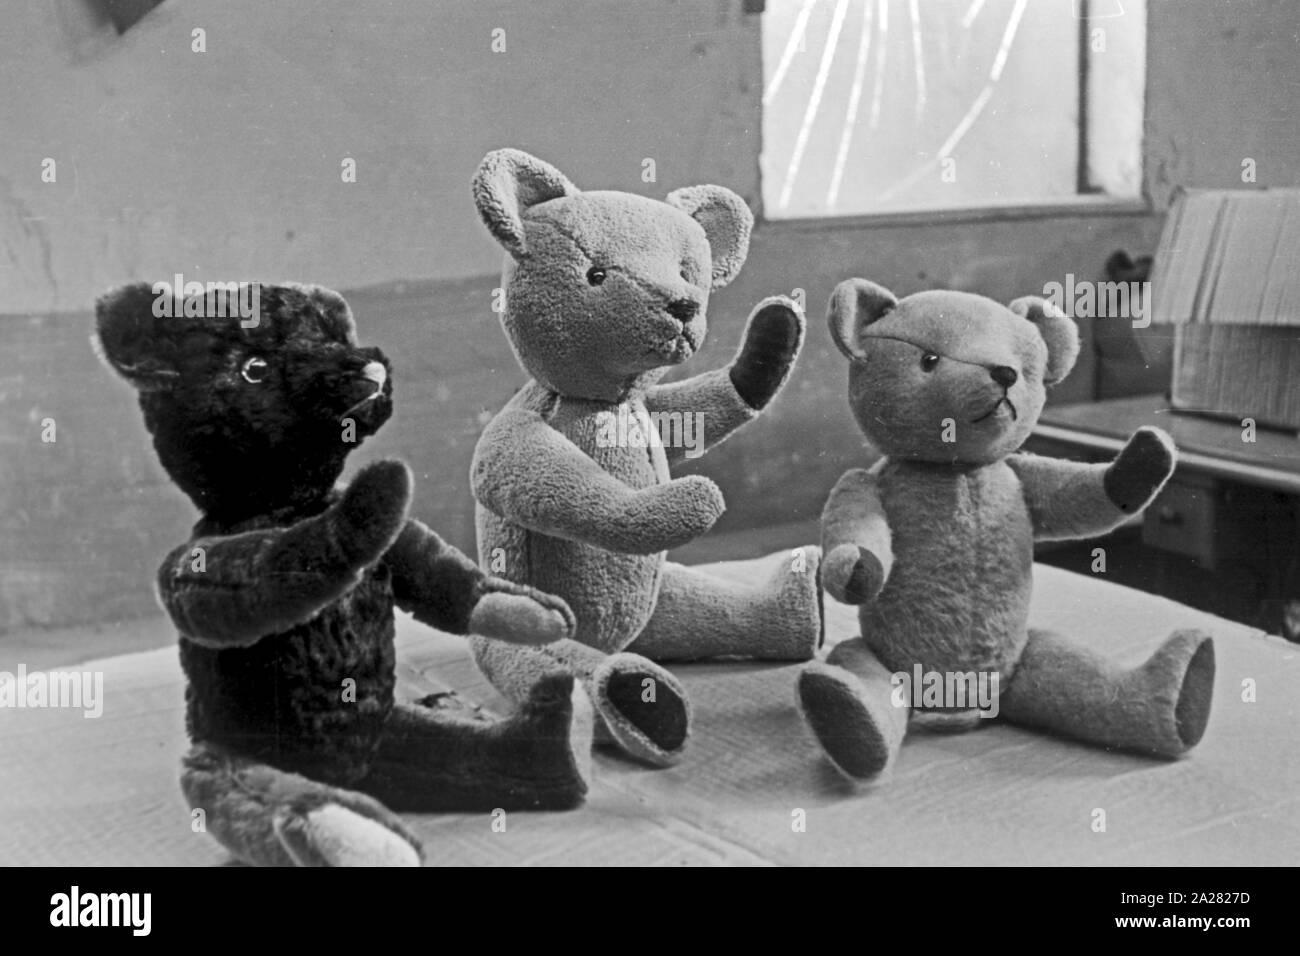 Puppenwerk Lauscha in Thüringen, 1940-50s. Doll factory in Lauscha, Thuringia, 1940-50s Stock Photo